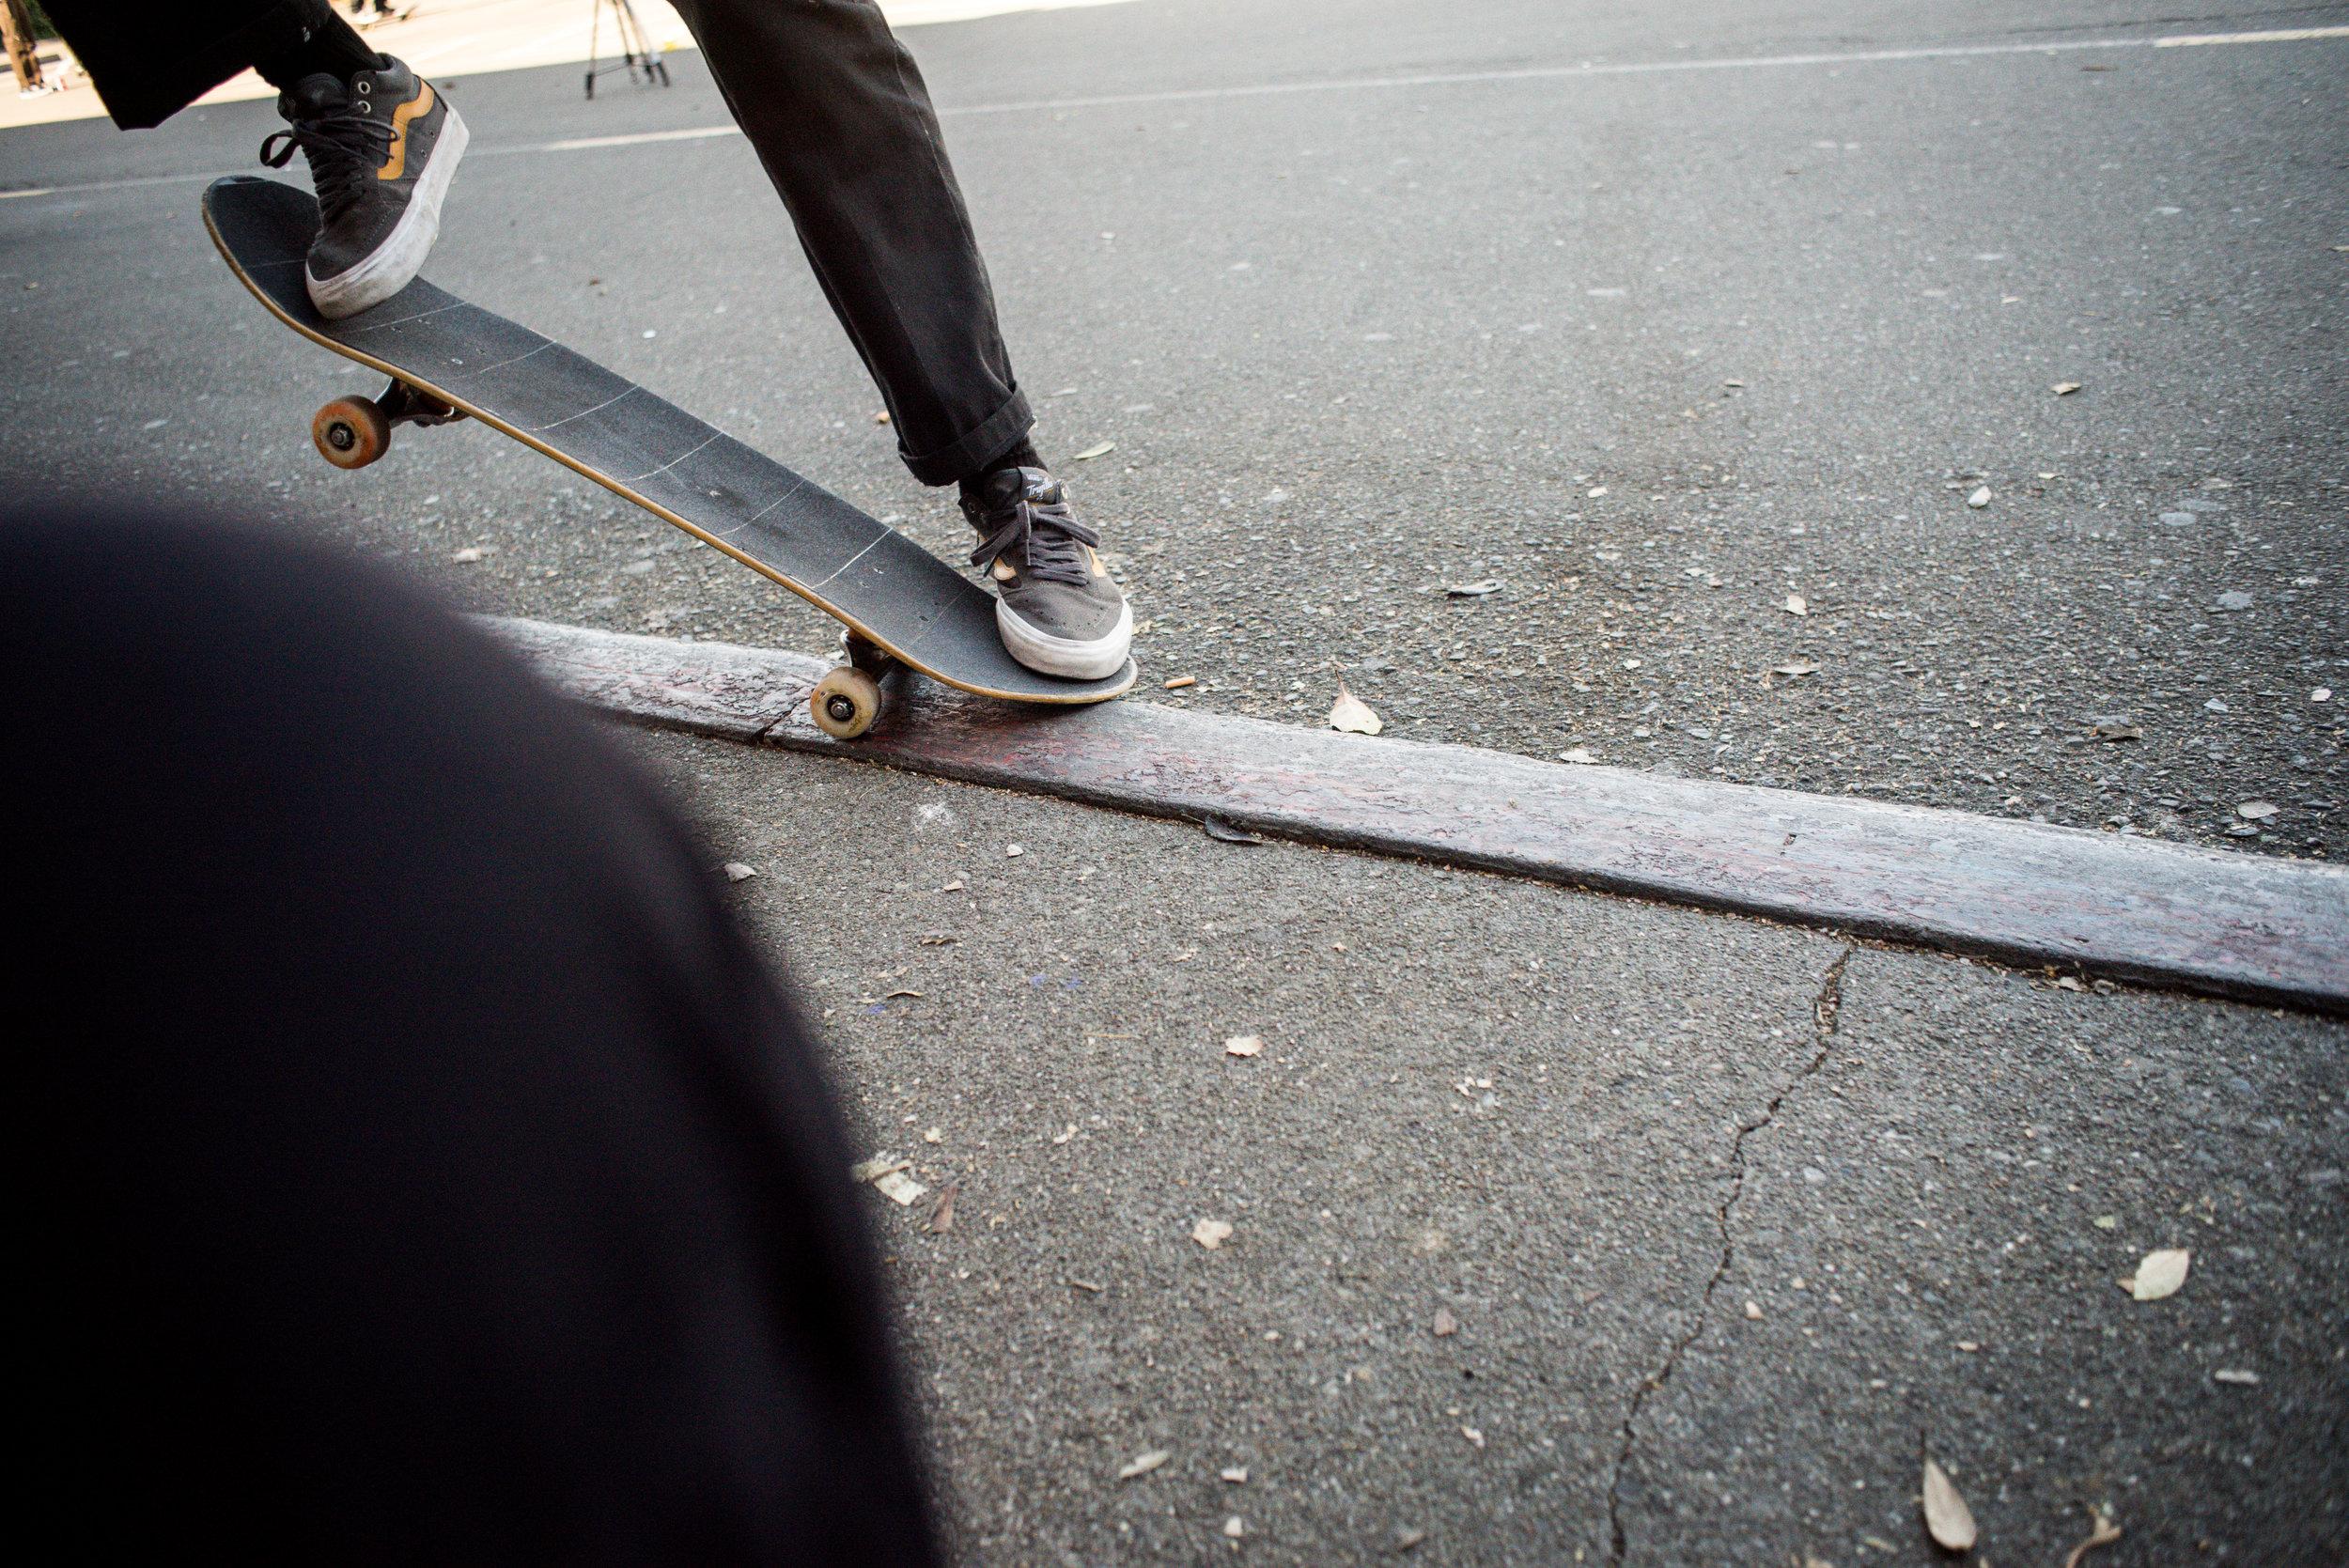 5.21.17_Skate_DMV-91.jpg